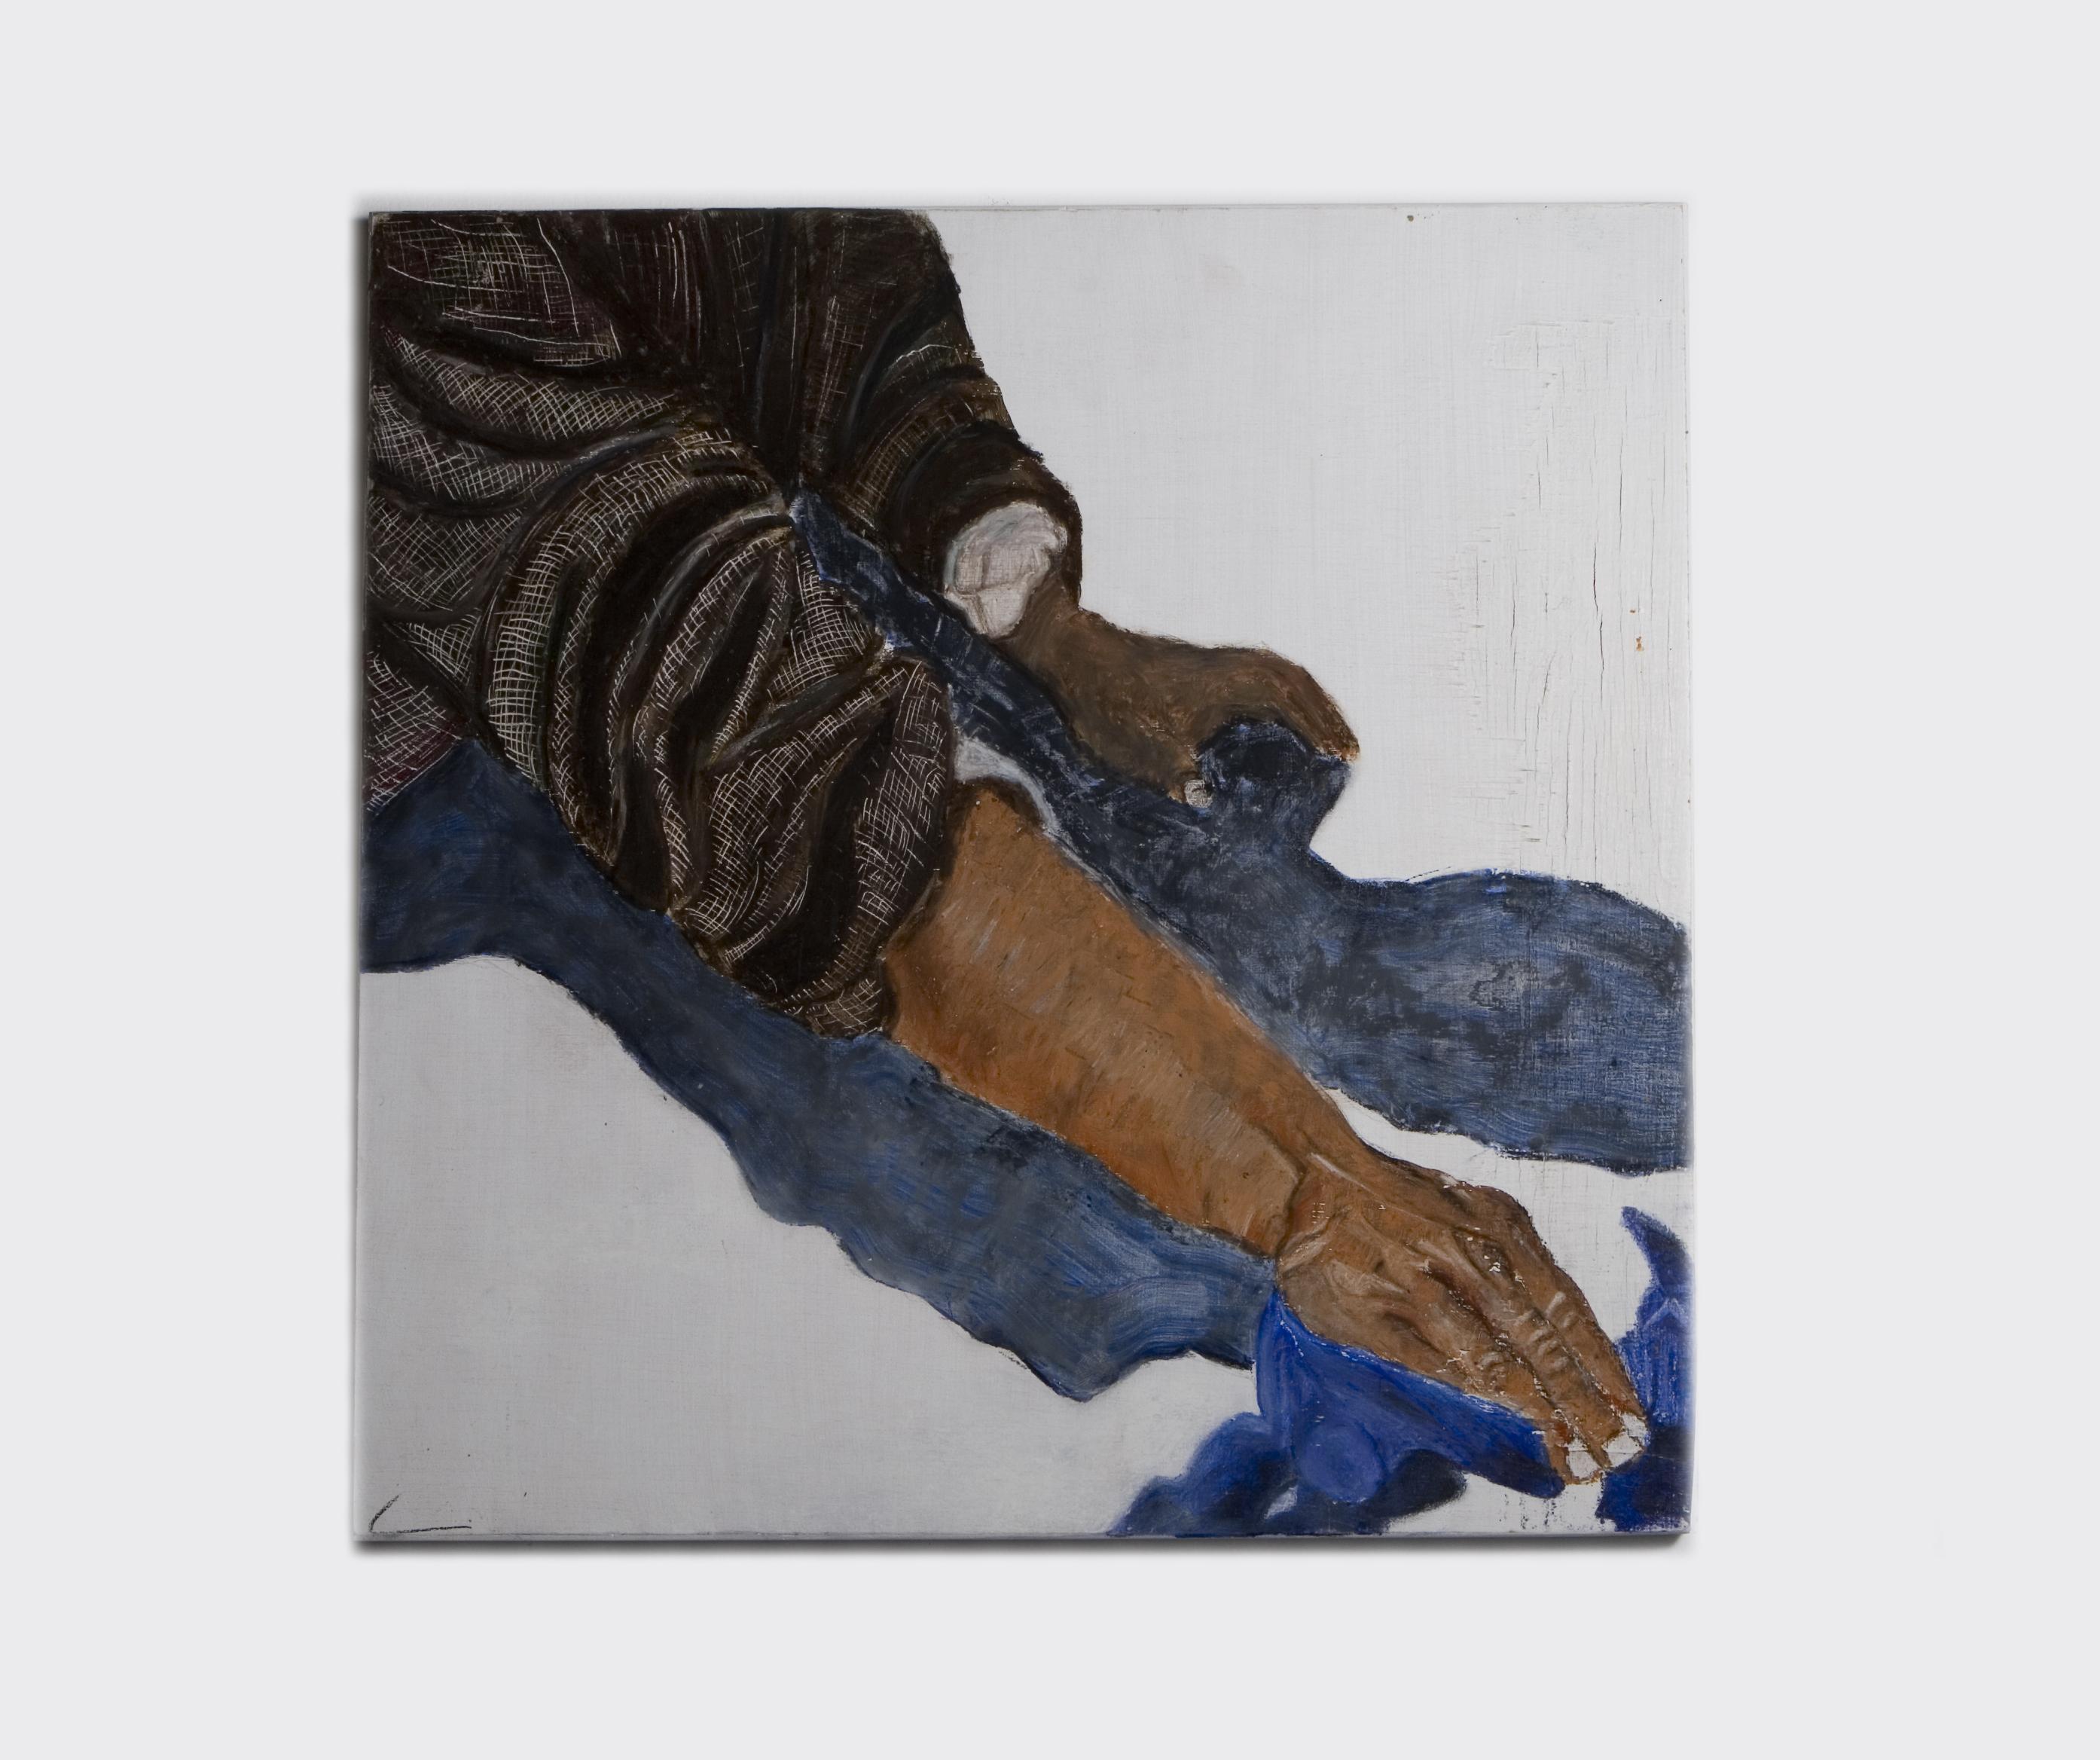 Untitled - 2009 - acrylic on wood - 38X38cm